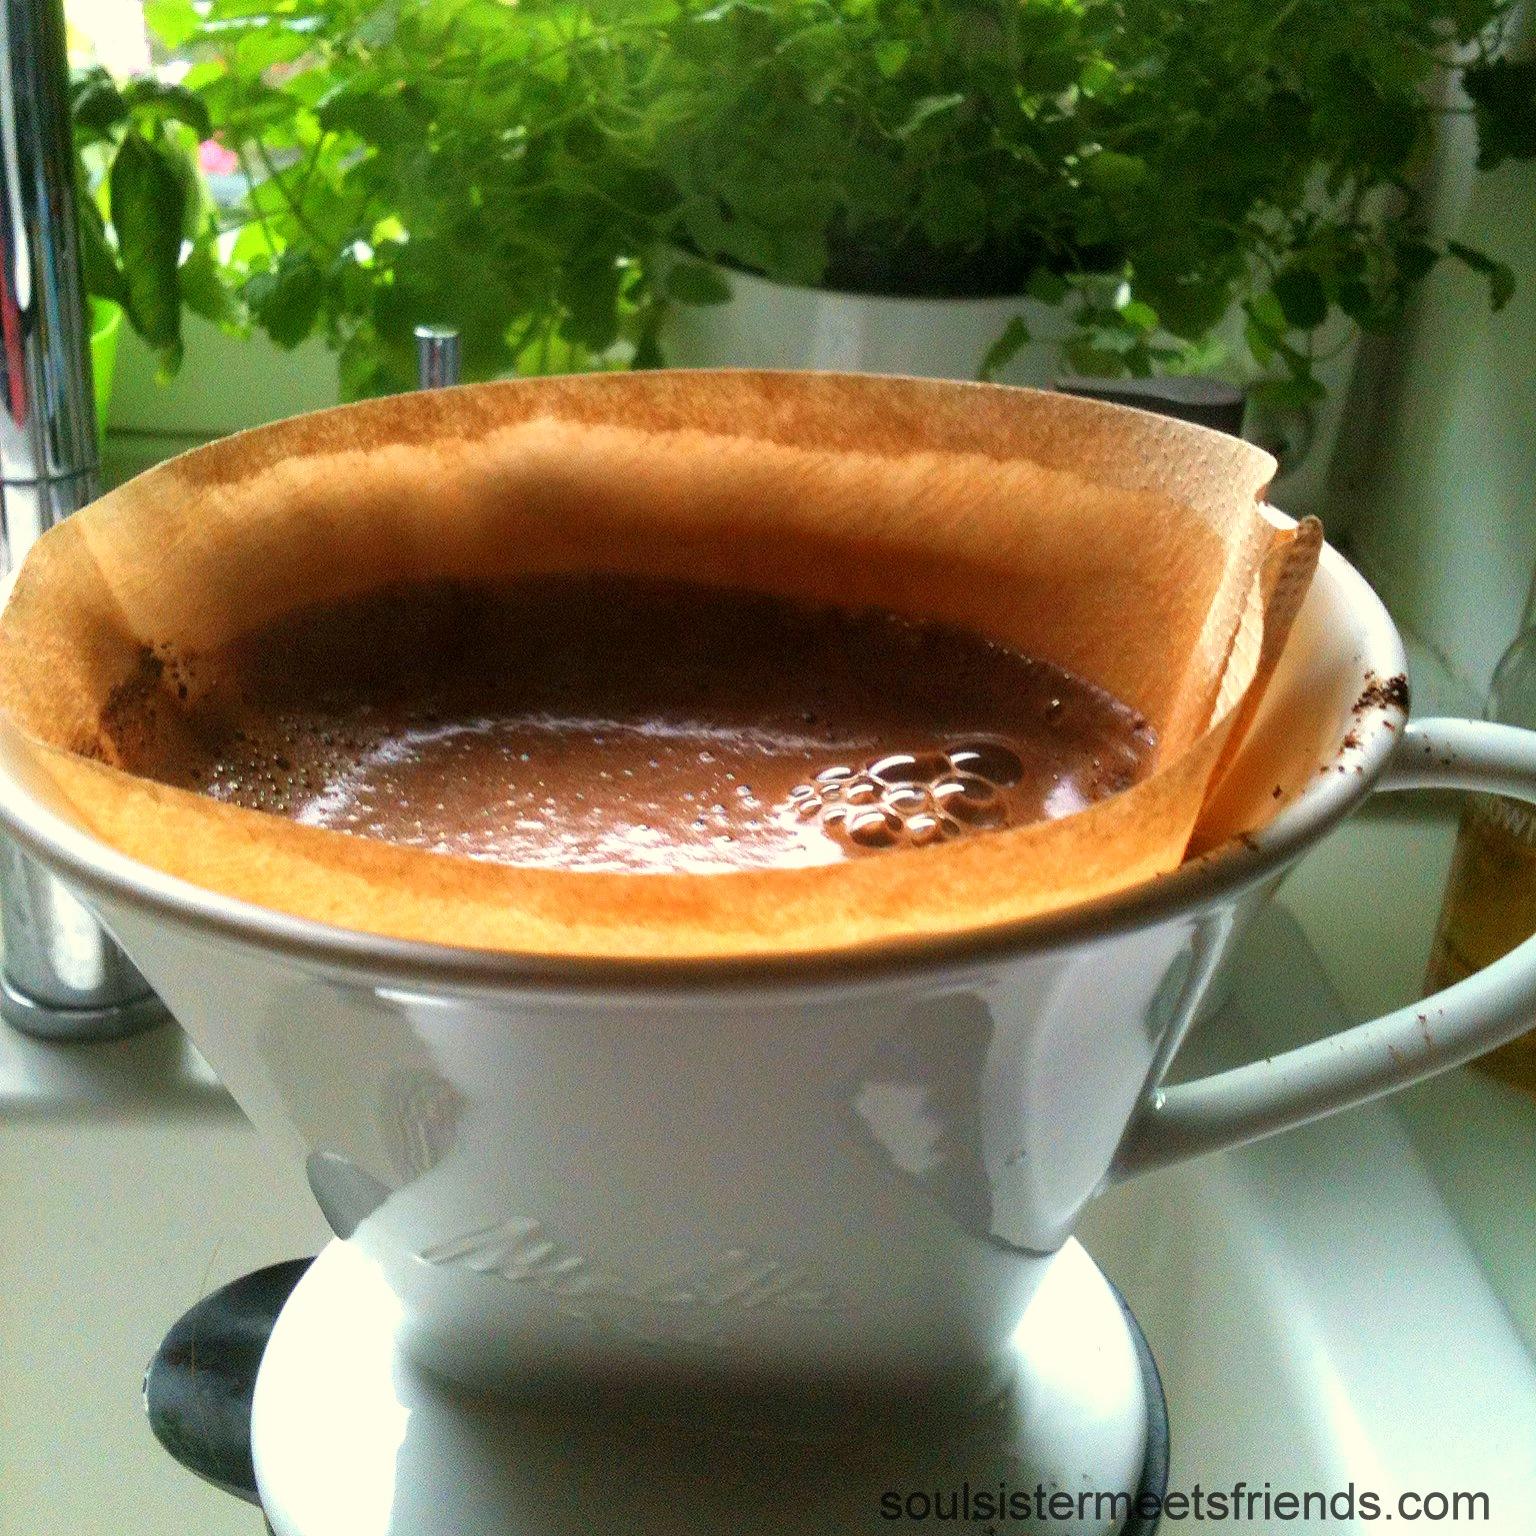 Kaffee-handgefiltert-sonntagsglück-soulsistermeetsfriends